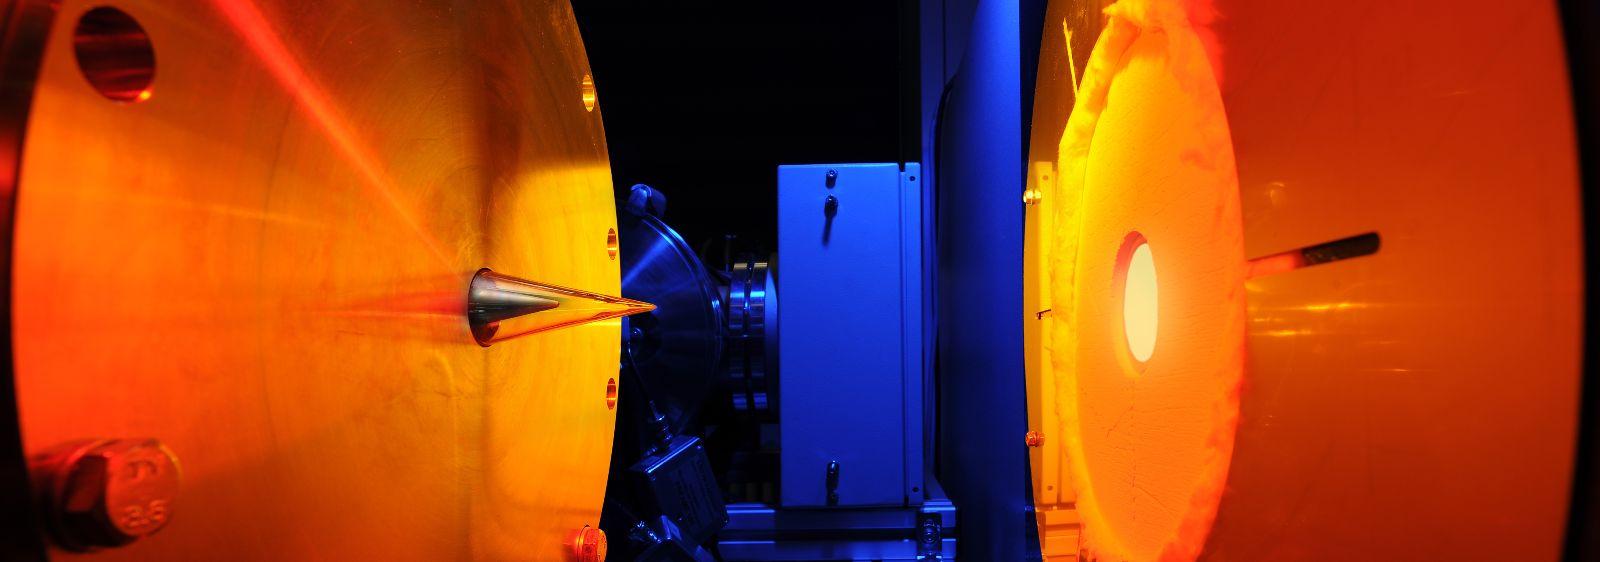 Solare Kraftstoffe